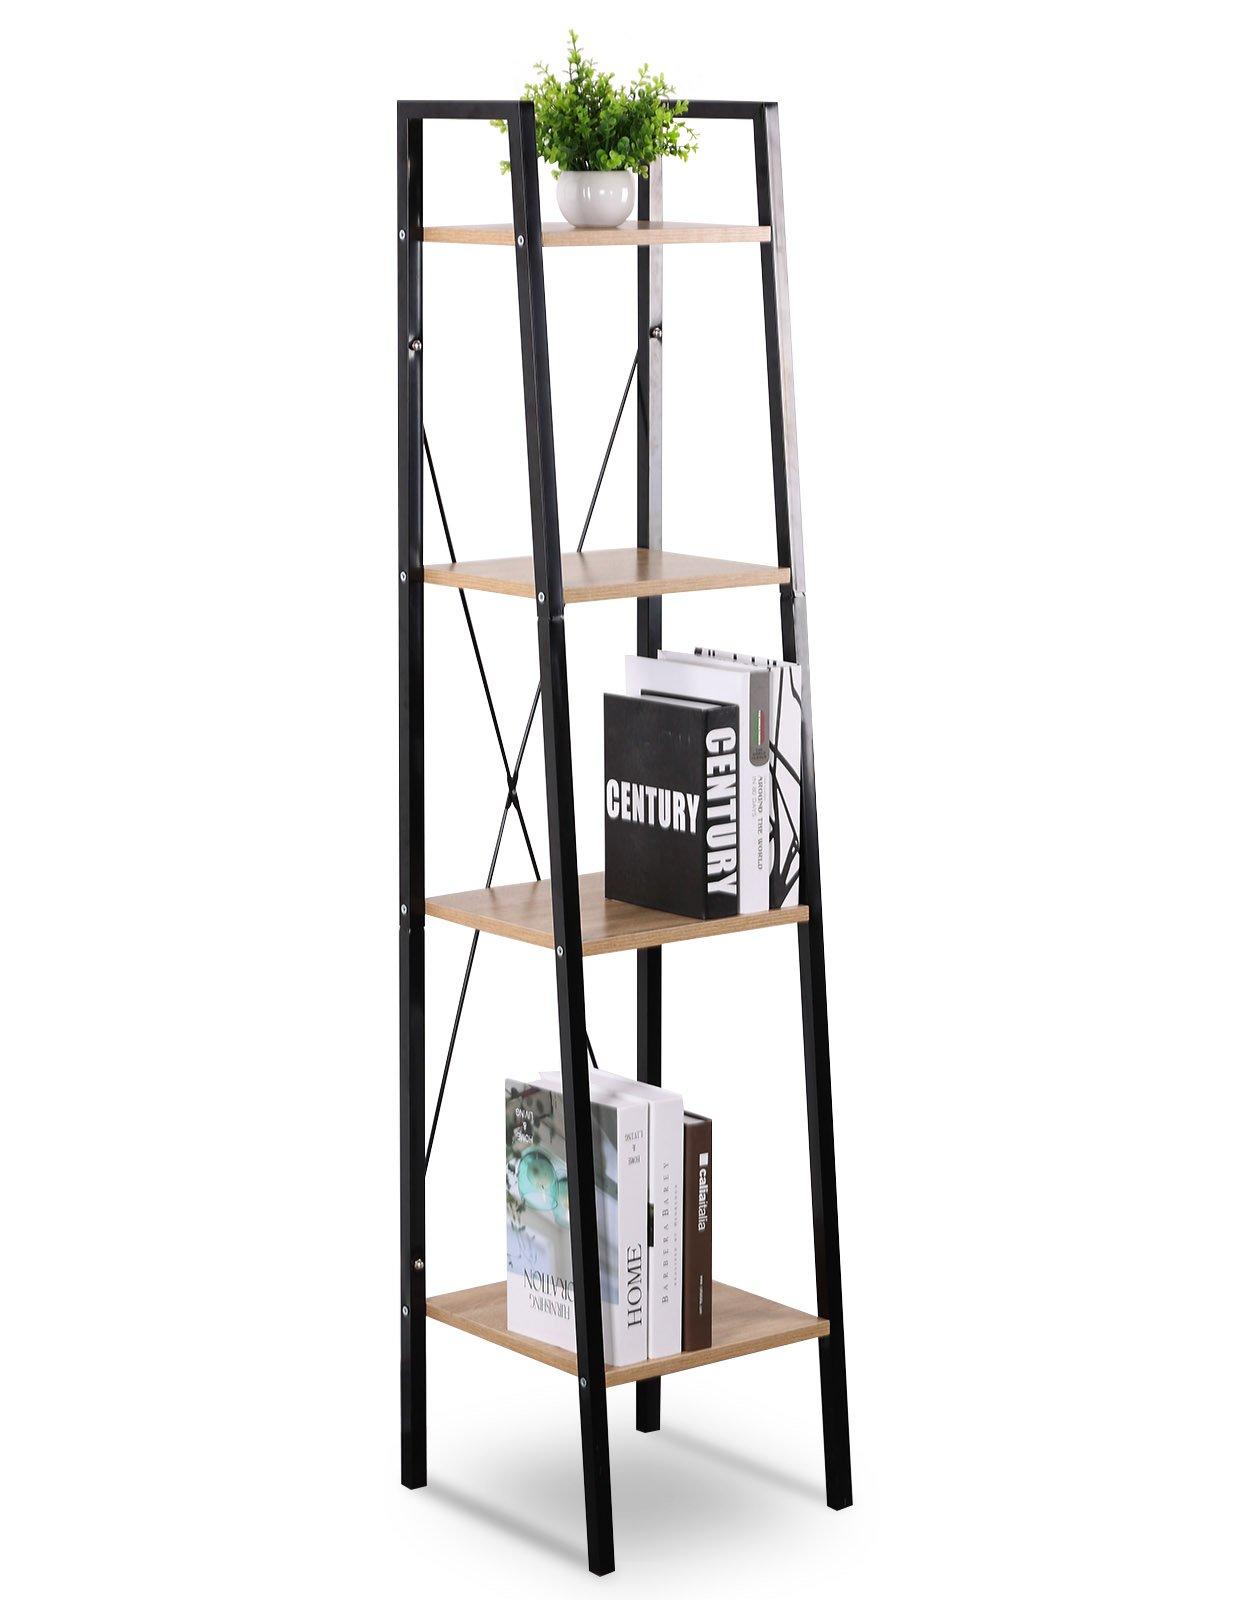 WOLTU Corner Shelf Unit Heavy Duty Wood with 4 Shelf Shelving